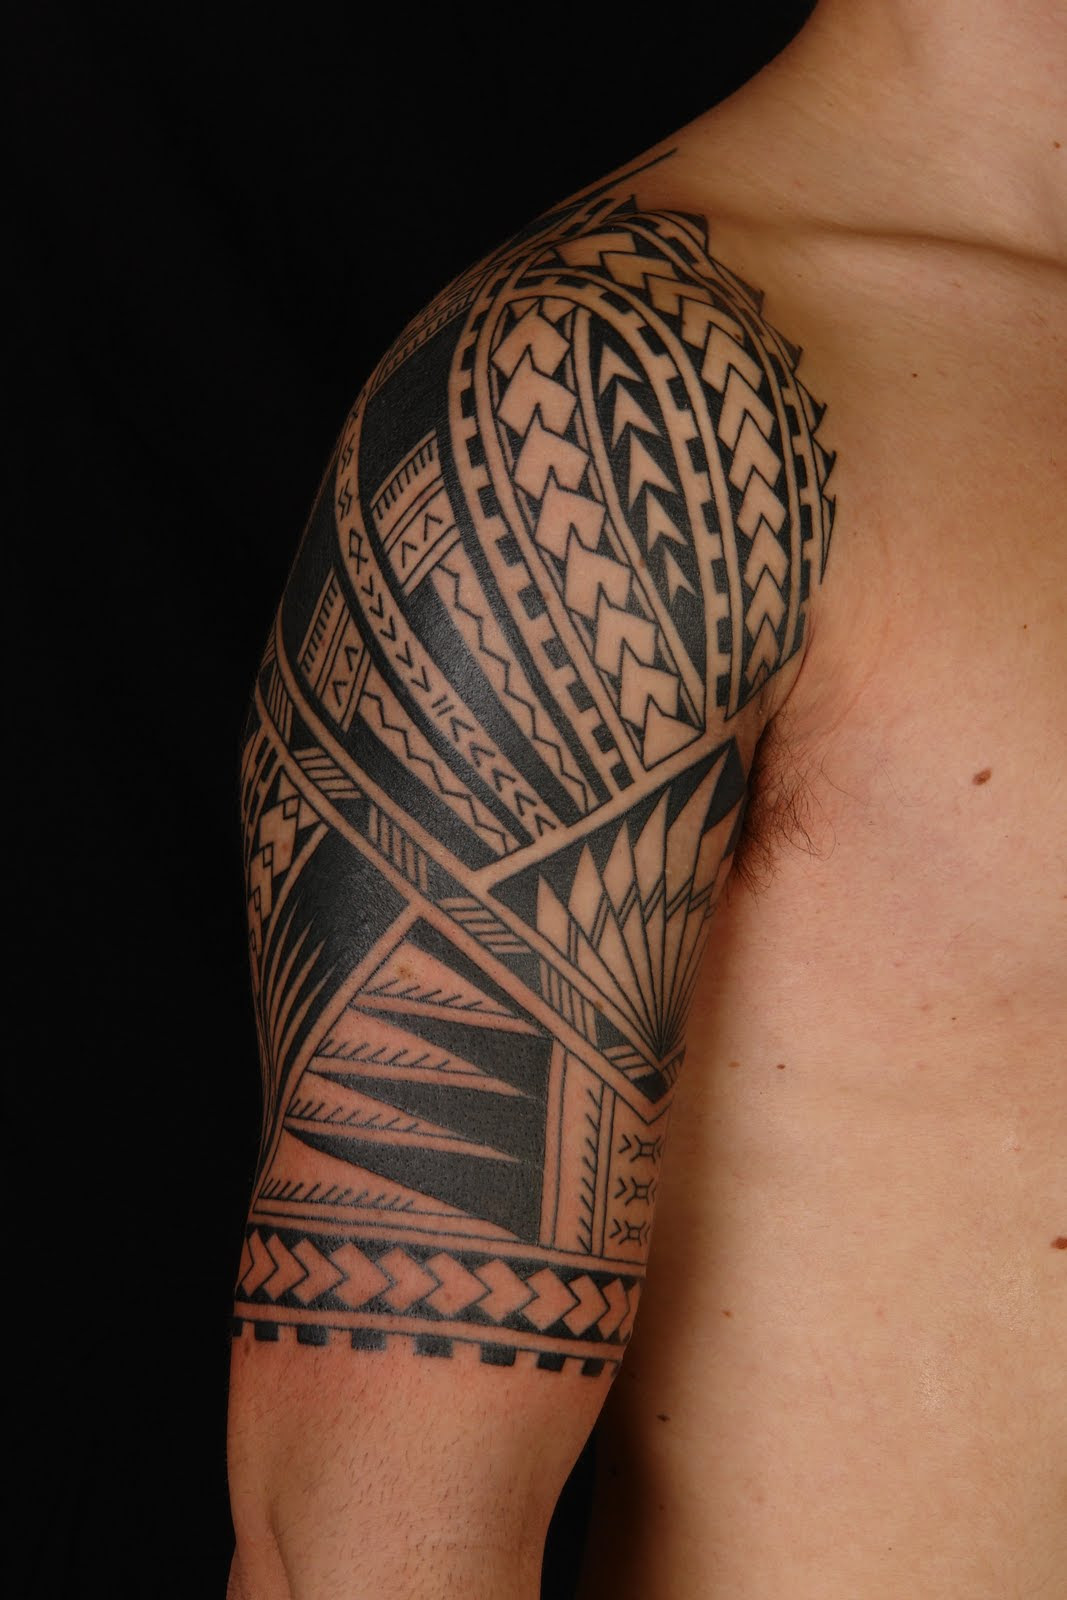 Maori Polynesian Half Sleeve Tattoo Ideas